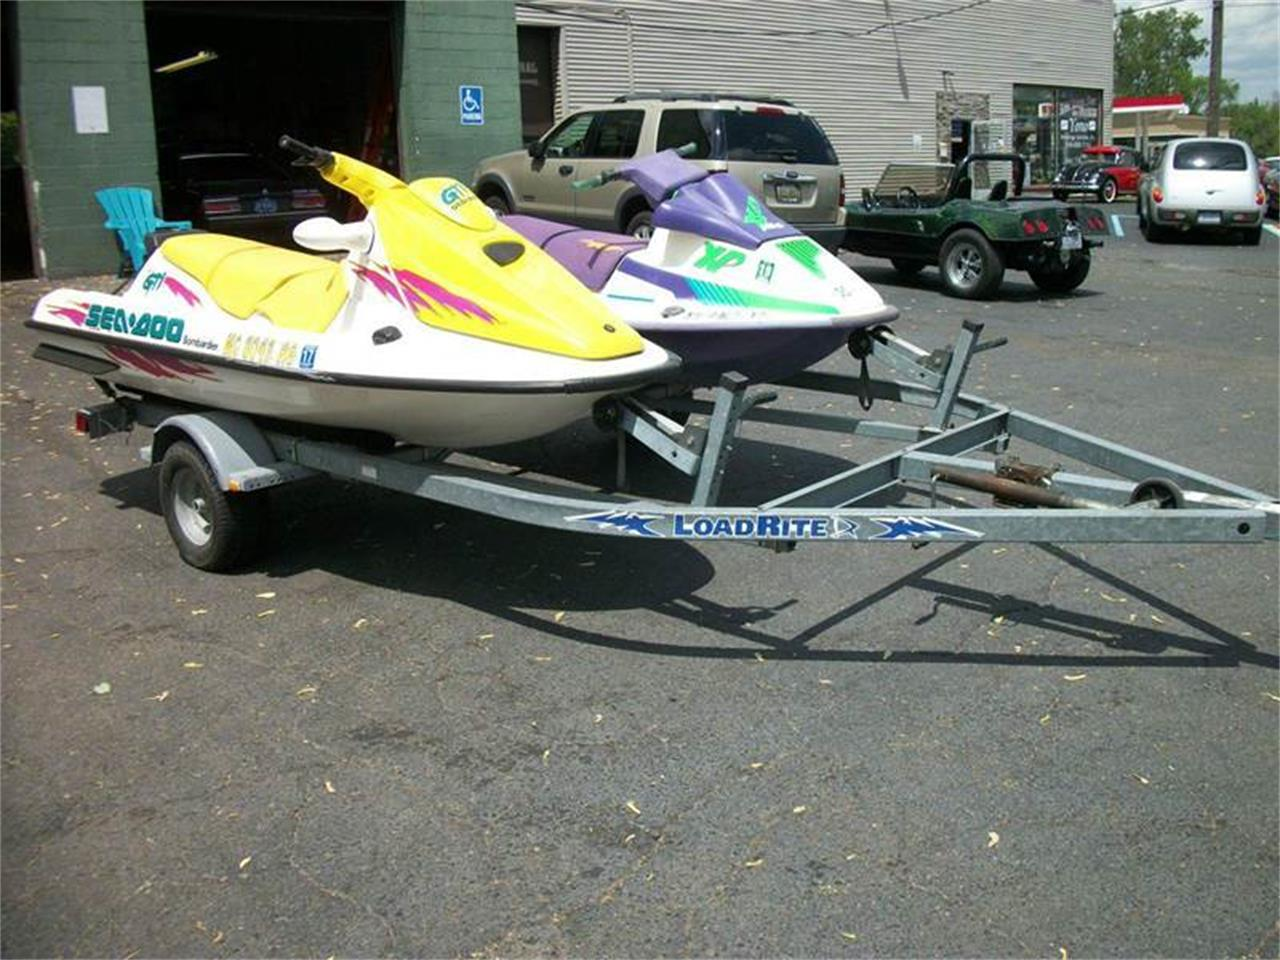 For Sale: 1996 Sea-Doo GTI & XP in Farmington, Michigan